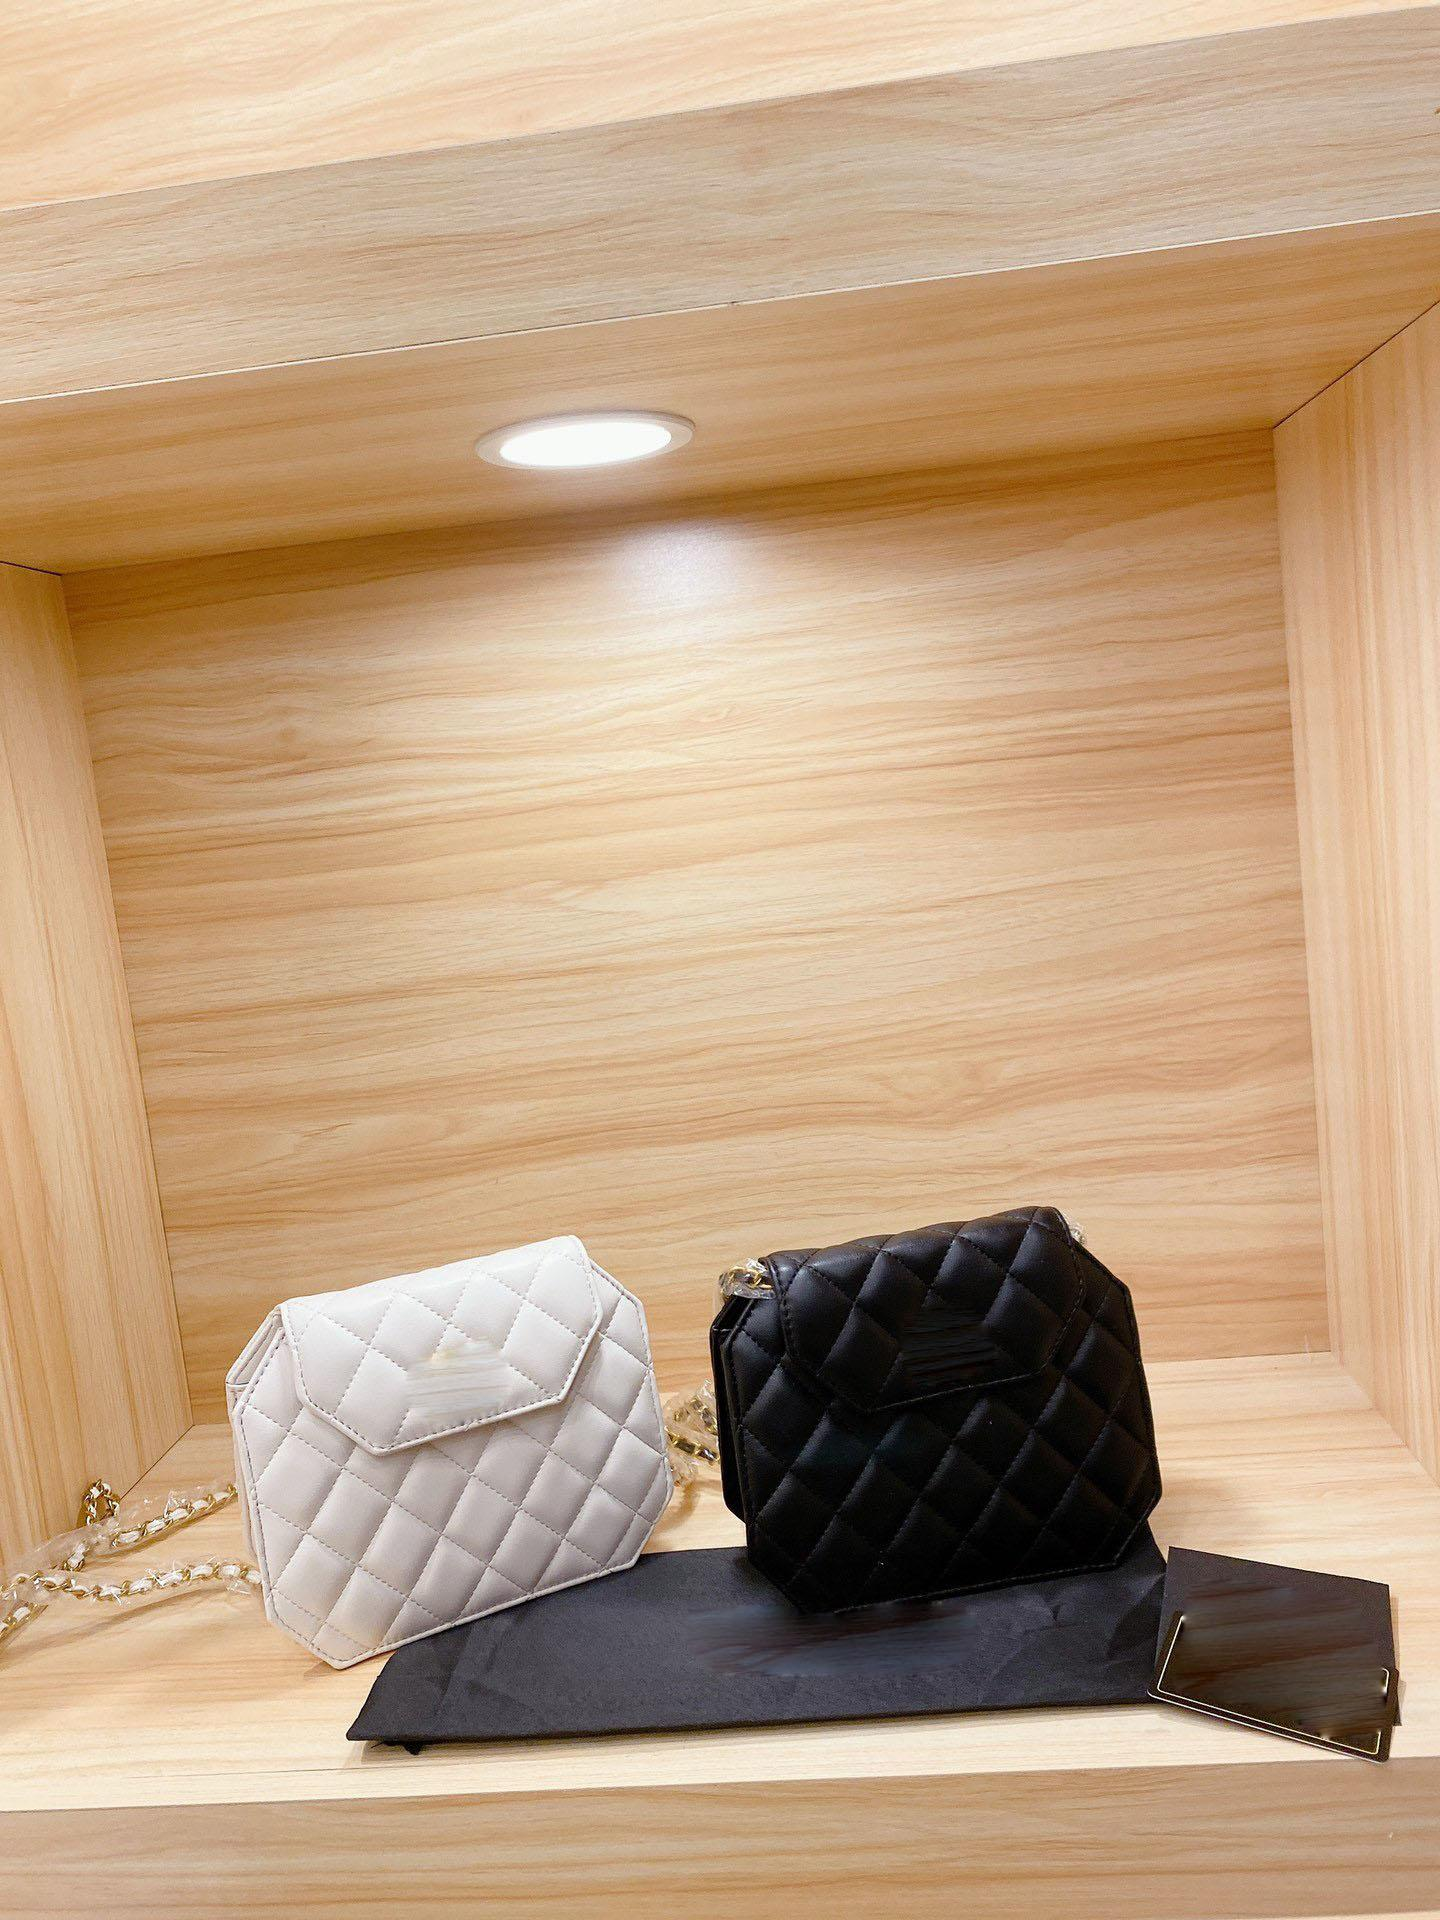 Chain crossbody bag 2020 womens luxury designer purses backpack wallet designer crossbody bag handbag designer bags